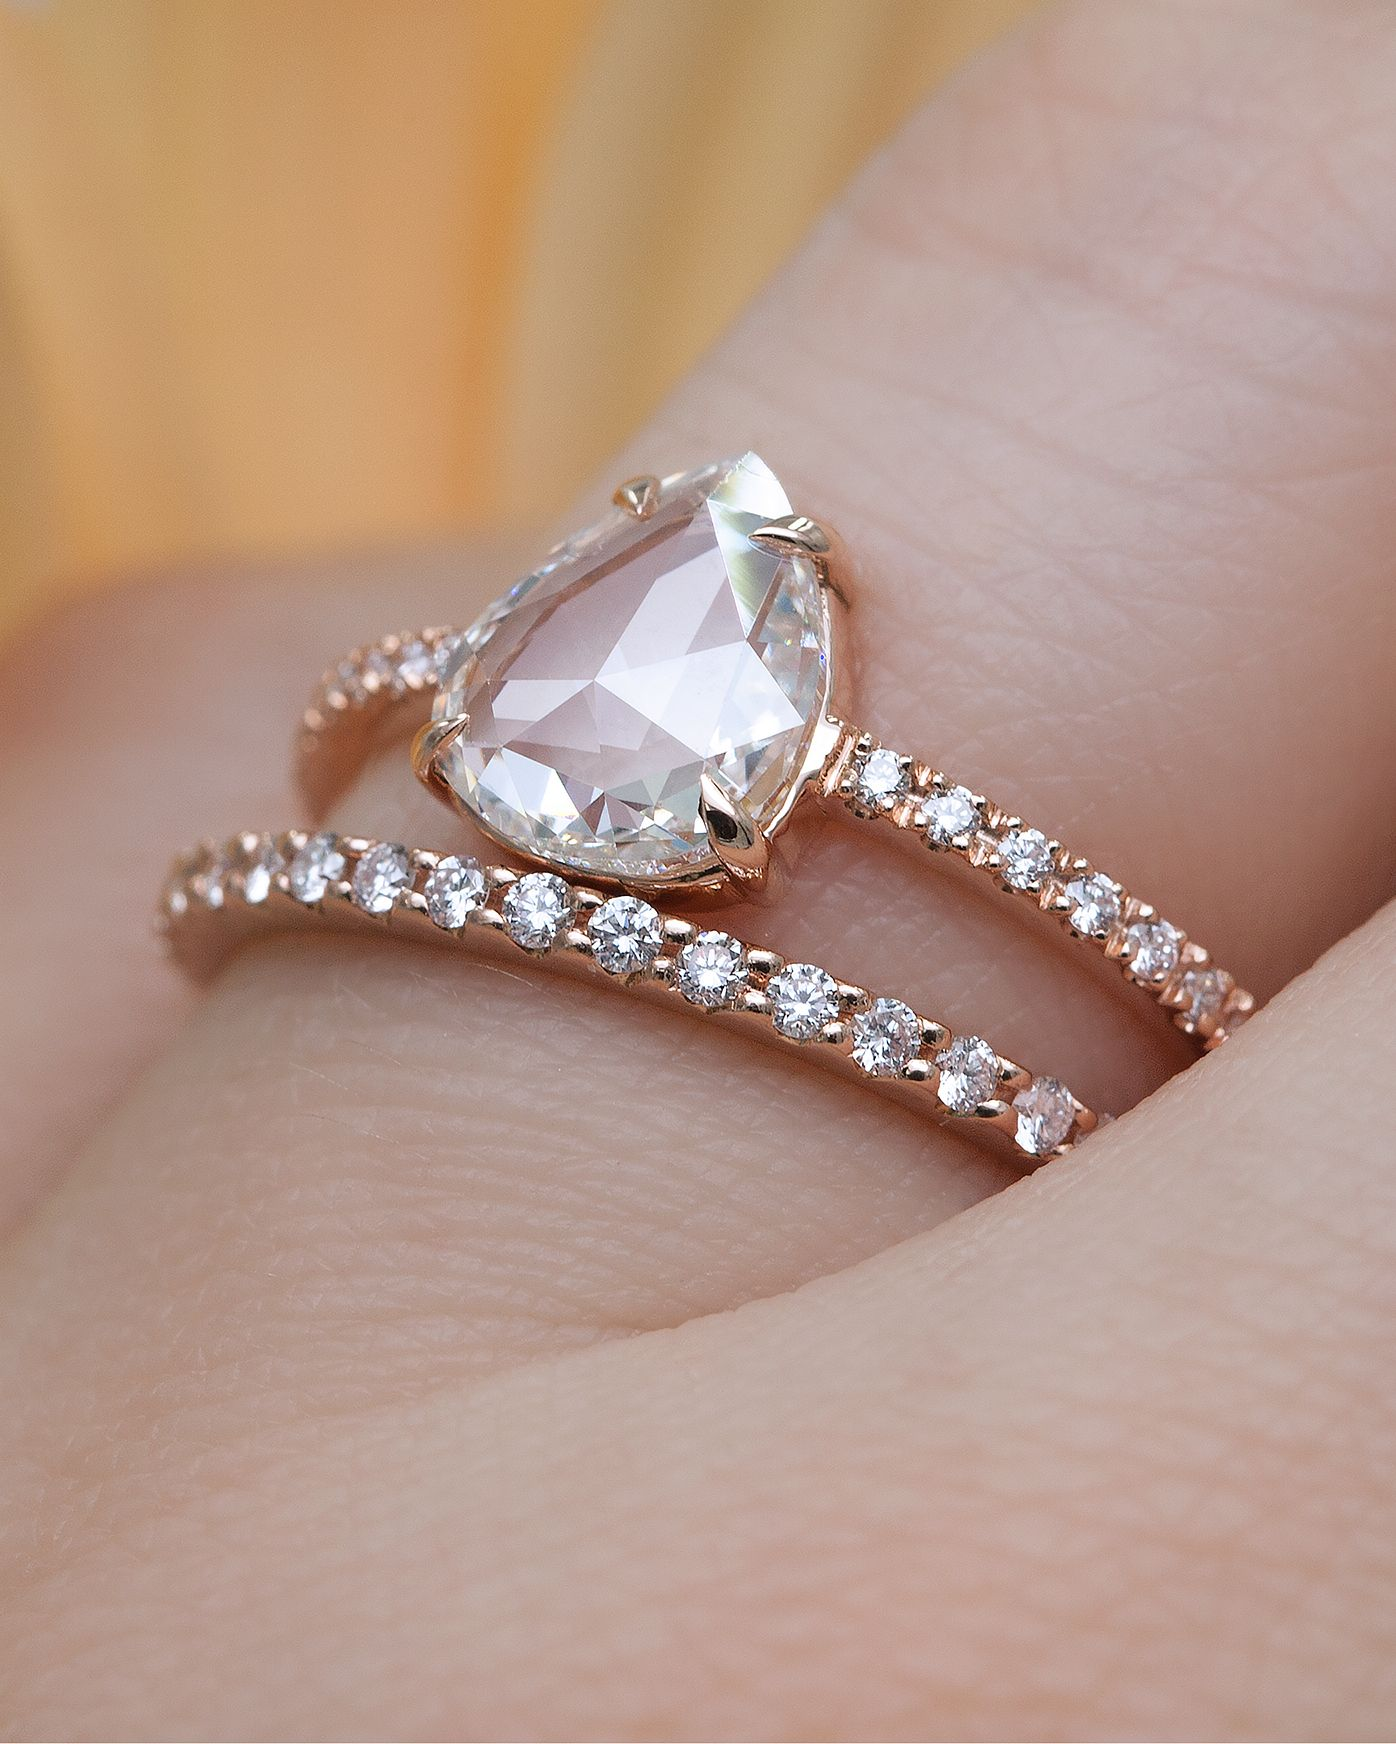 1 Carat Rose Cut Pear Diamond Ring in Rose Gold by Everett